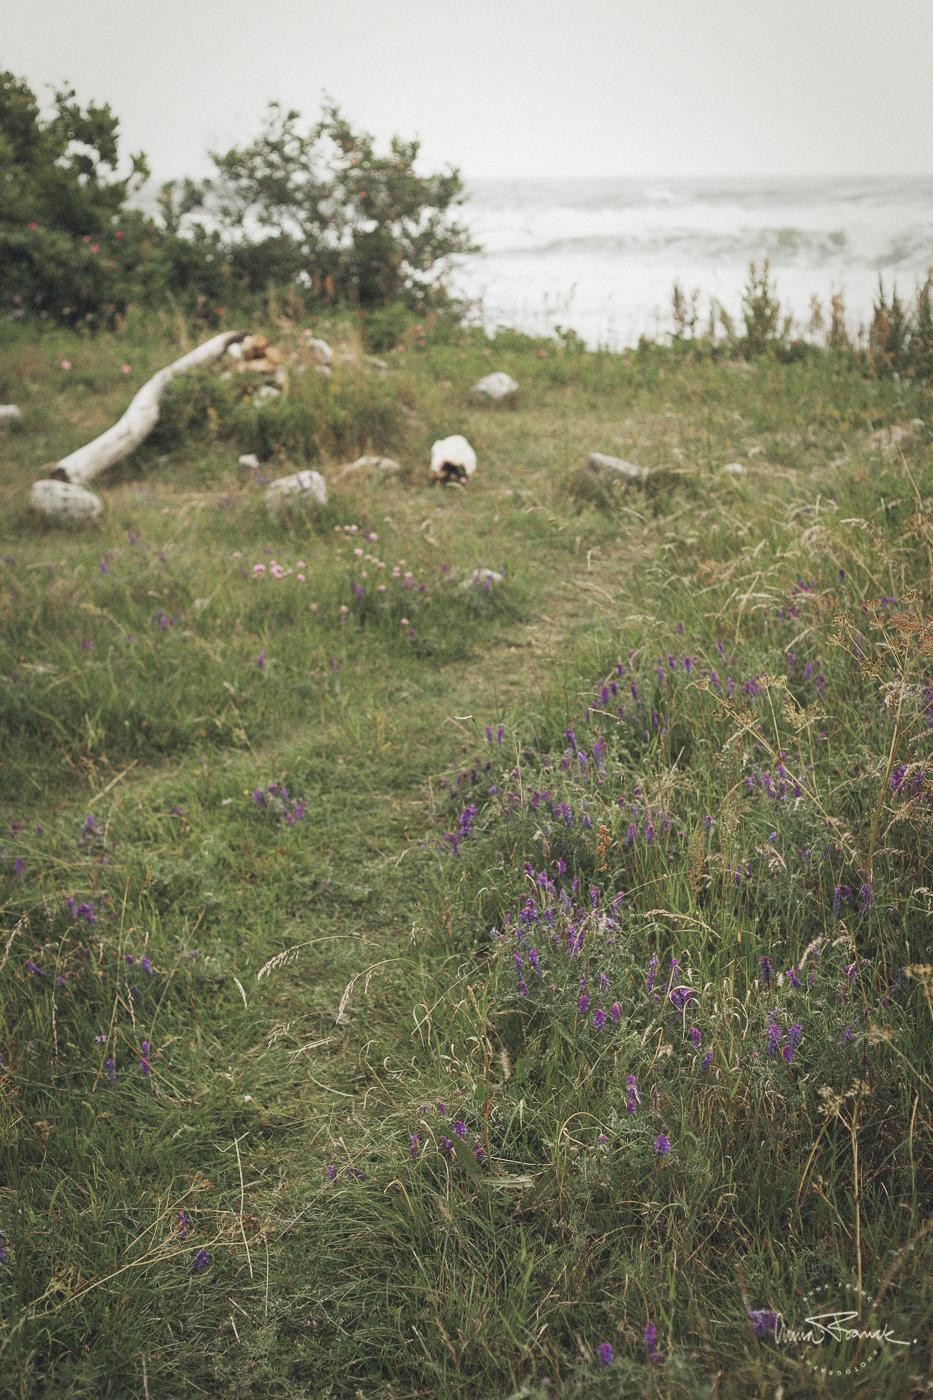 anna, franck, photography, stockholm, photographer, pargas, finland, sweden, portraits, skåne, österlen, baskemölla, natural, green, summer, countrylife, coast, beach, architecture, lifestyle, organicliving